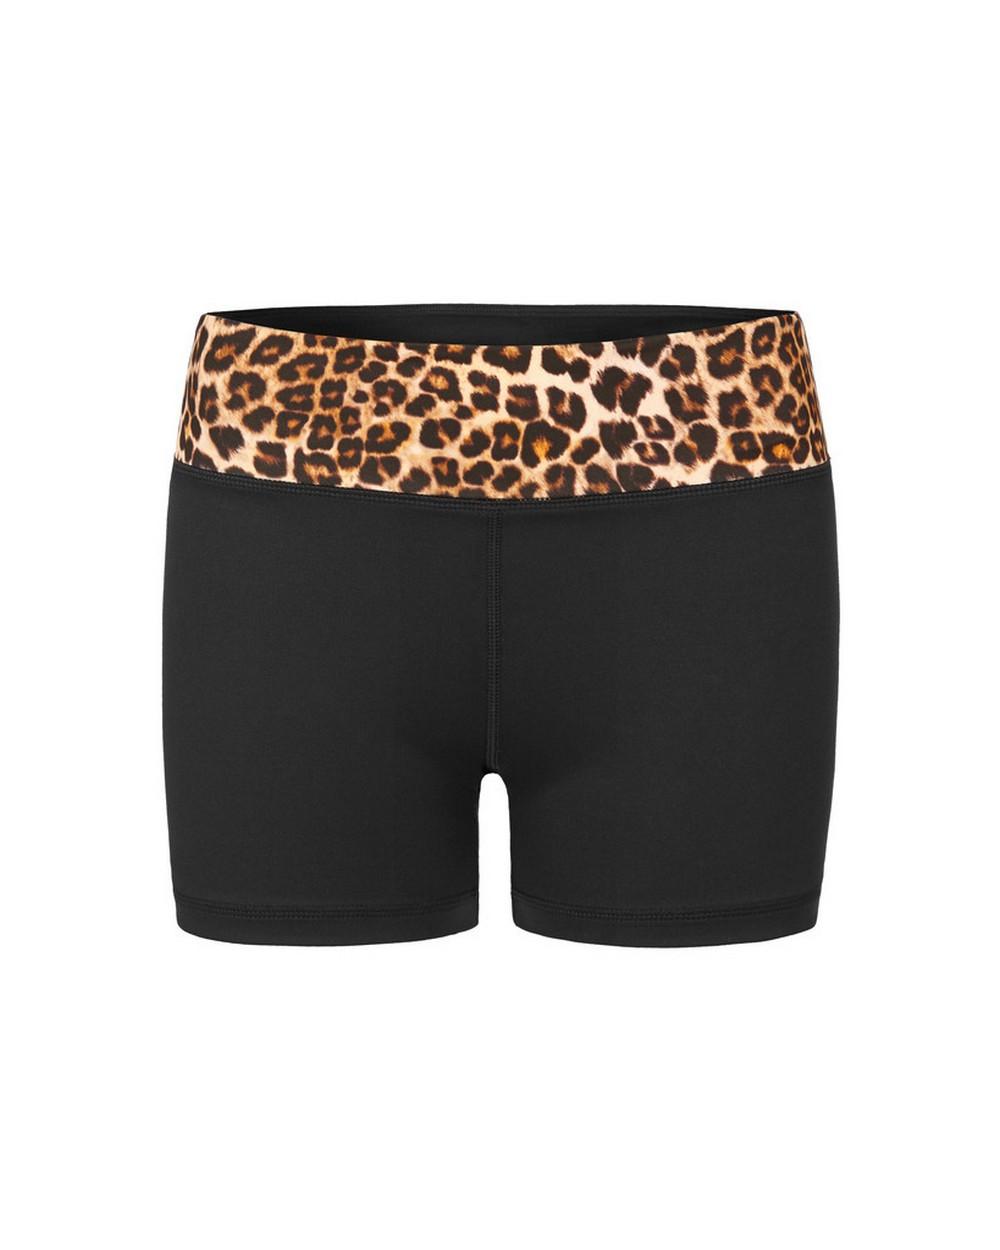 Vie Active Leopard Tanya Dance Shorts